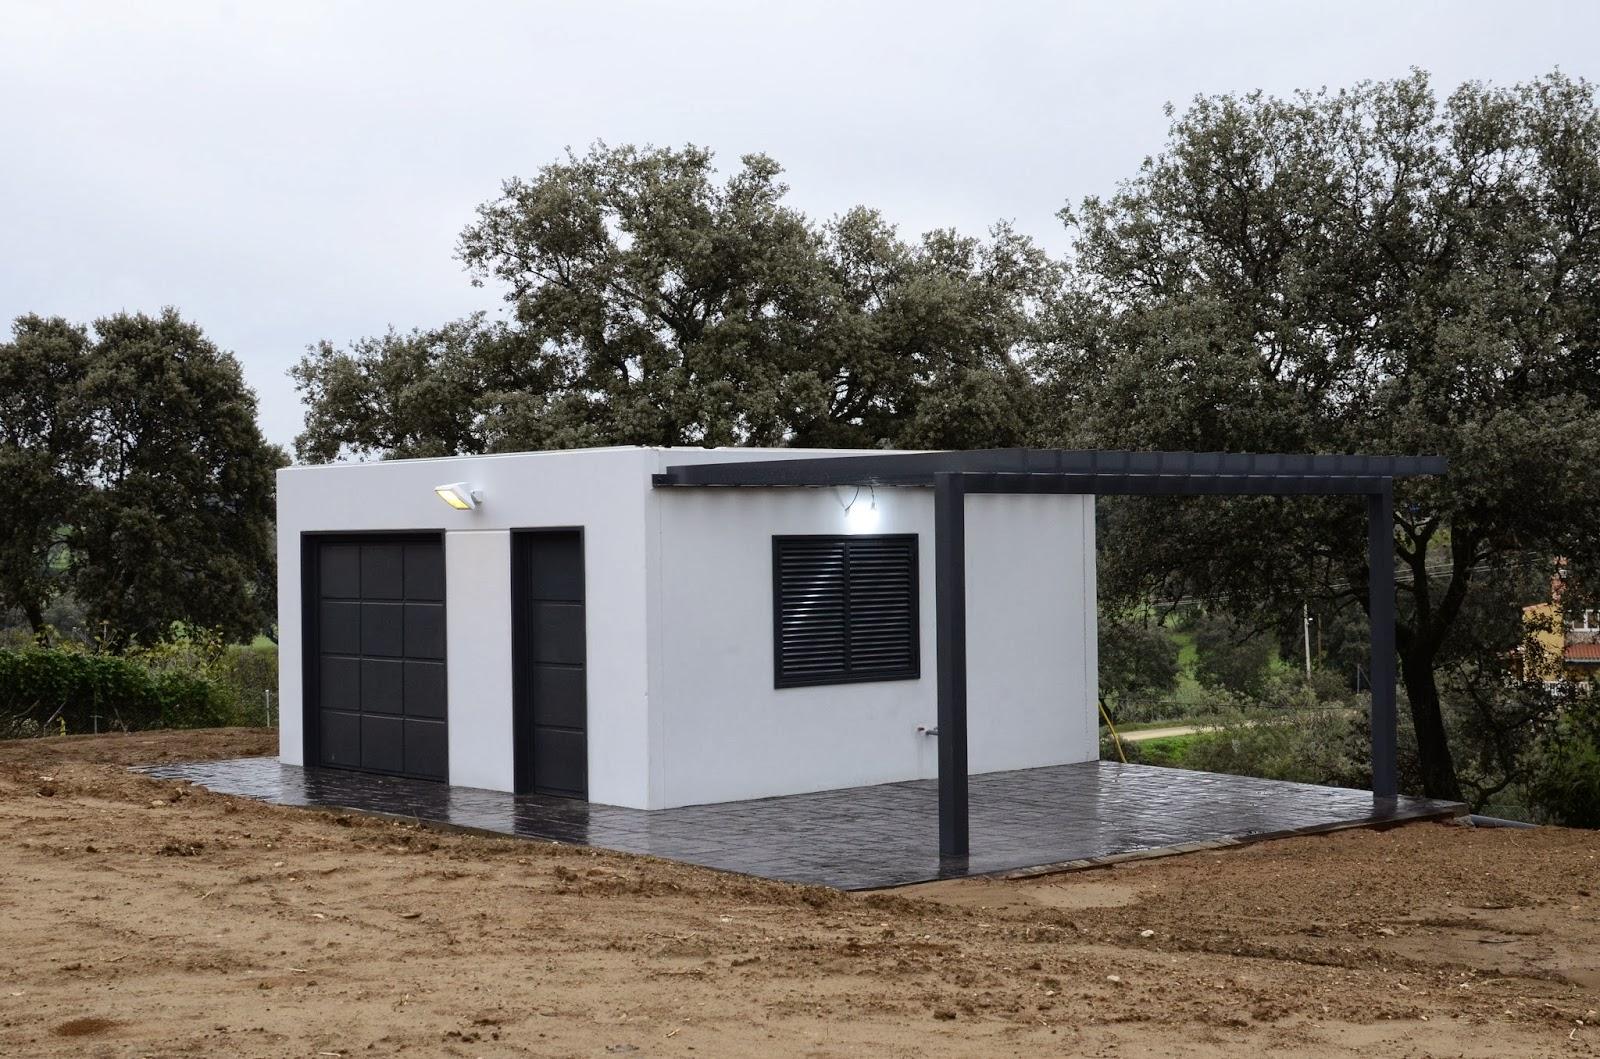 Casas prefabricadas madera casas prefabricadas en salamanca - Casas prefabricadas de hormigon baratas ...